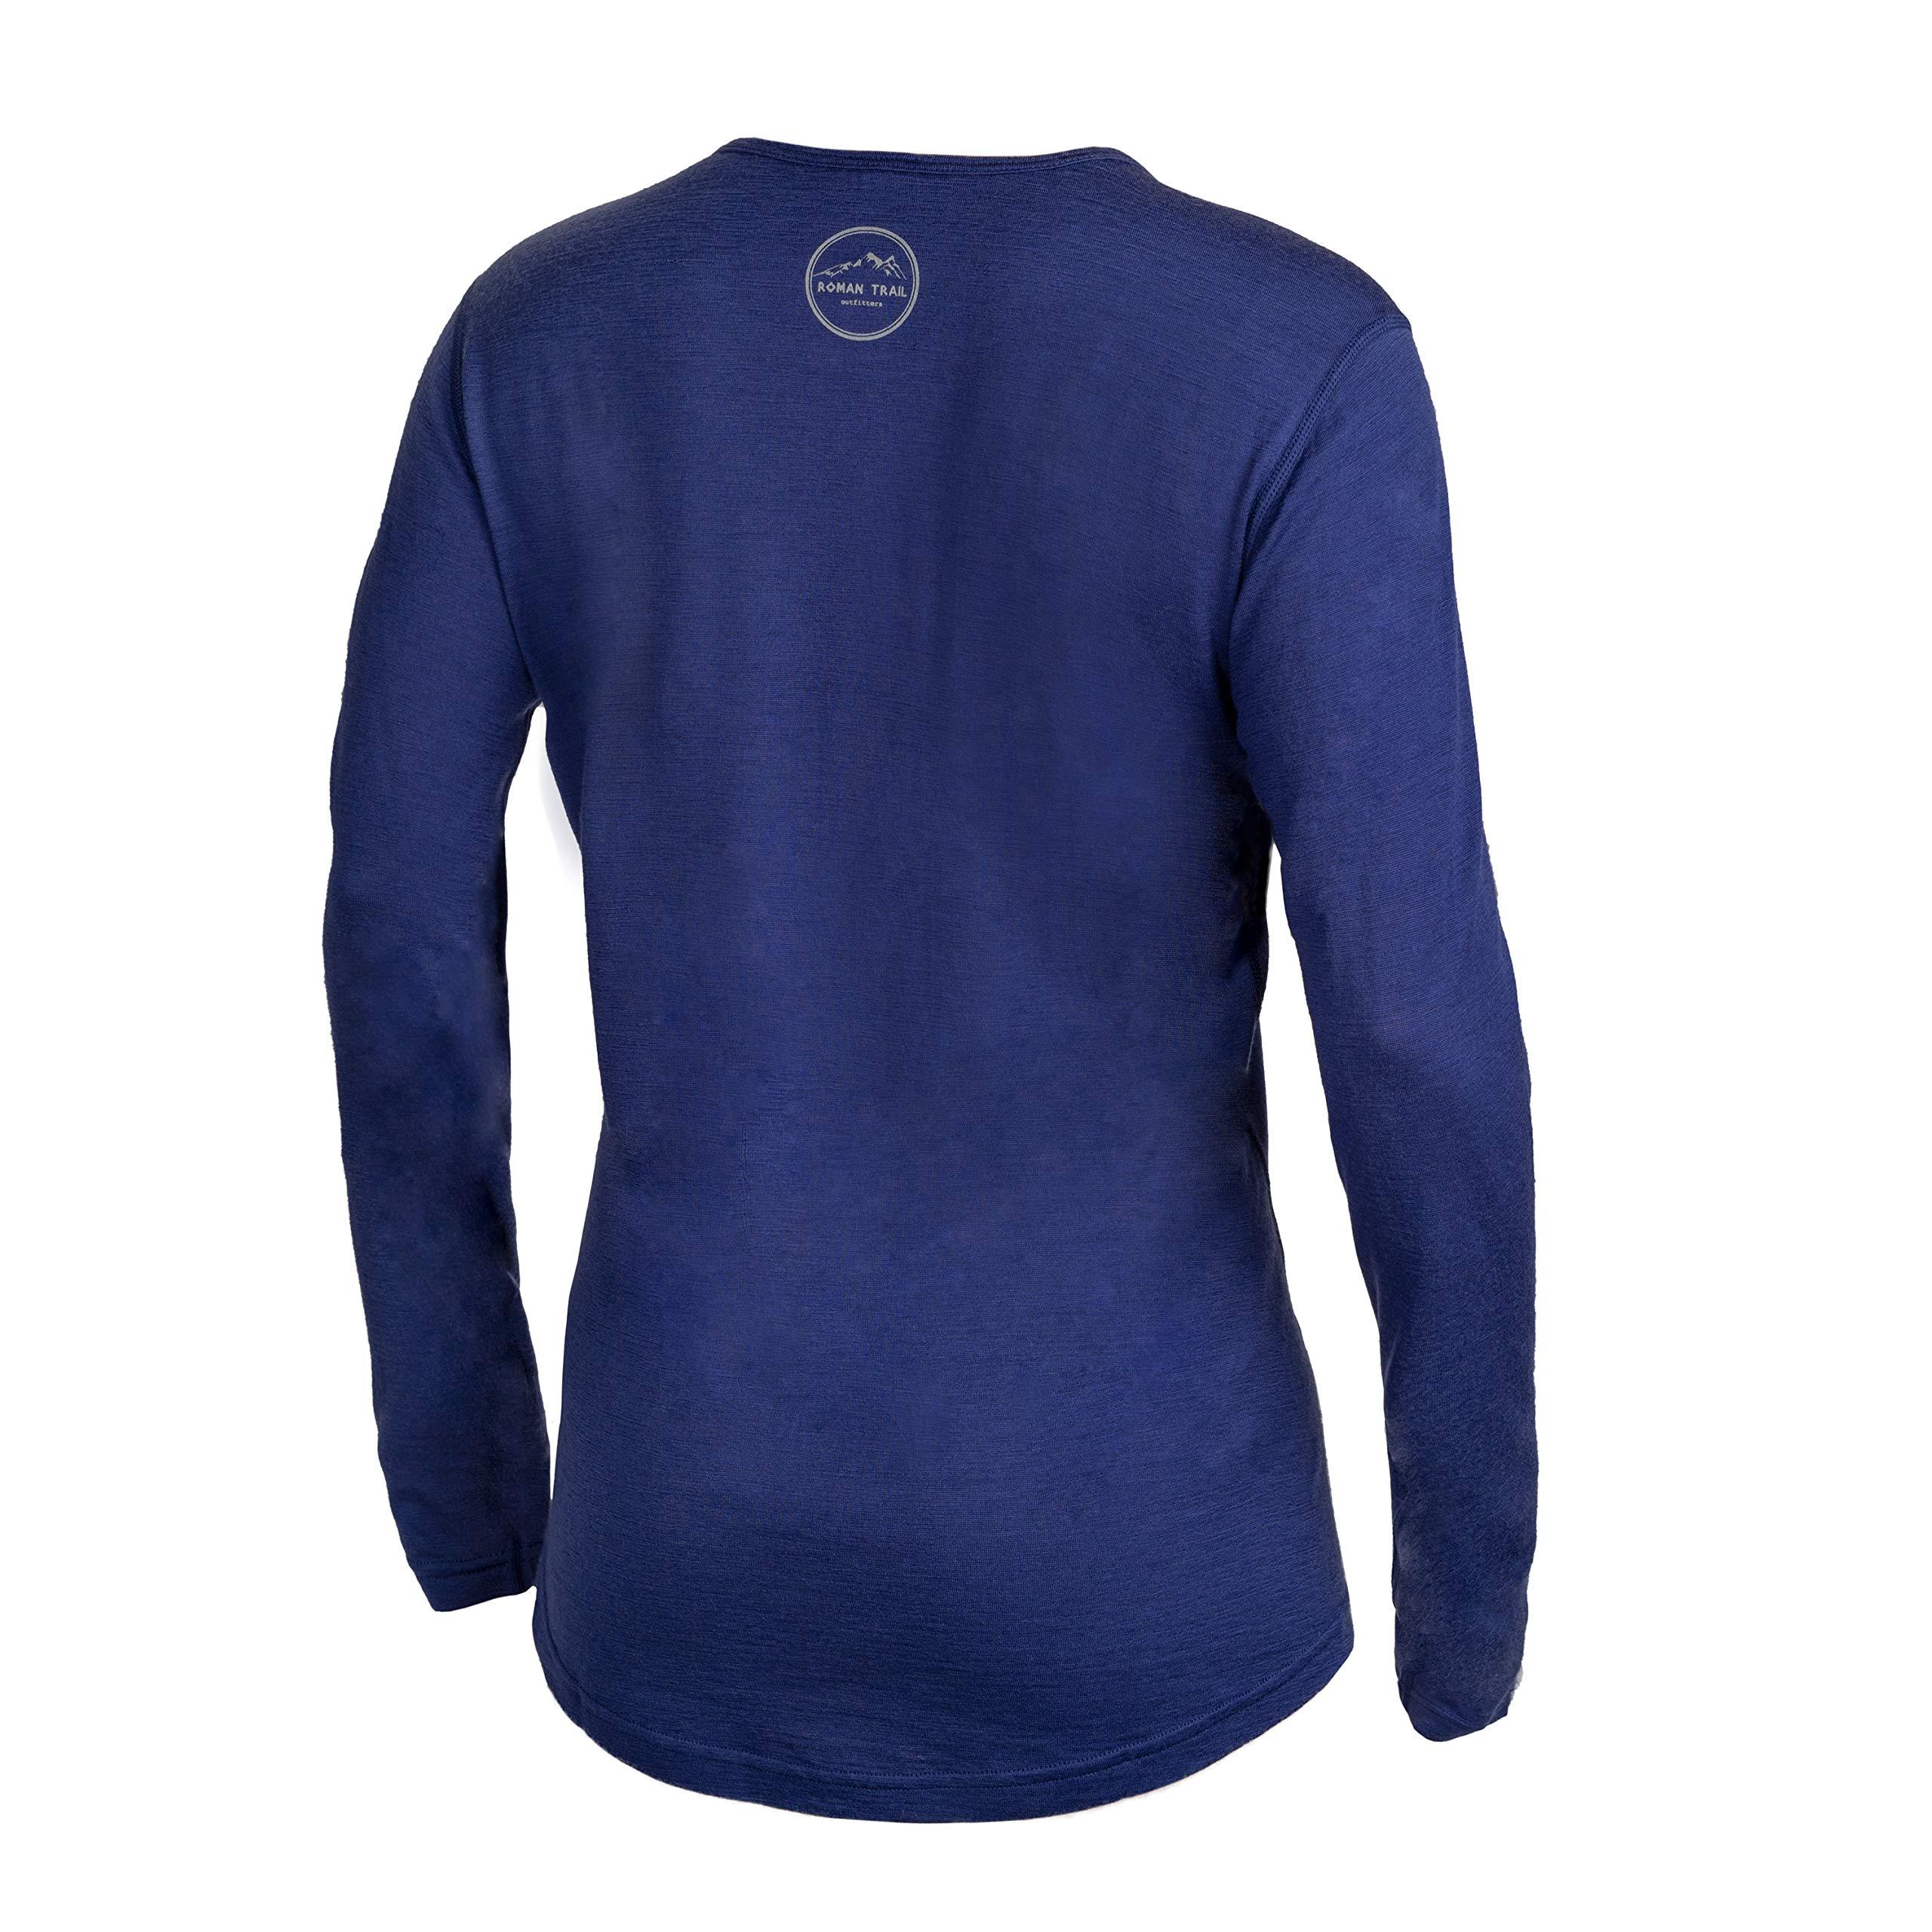 Western Owl Outfitters Merino Wool Women's Long Sleeve Top |Crew Neck Shirt | Lightweight | Moisture Wicking | Base Layer (Small, Navy)